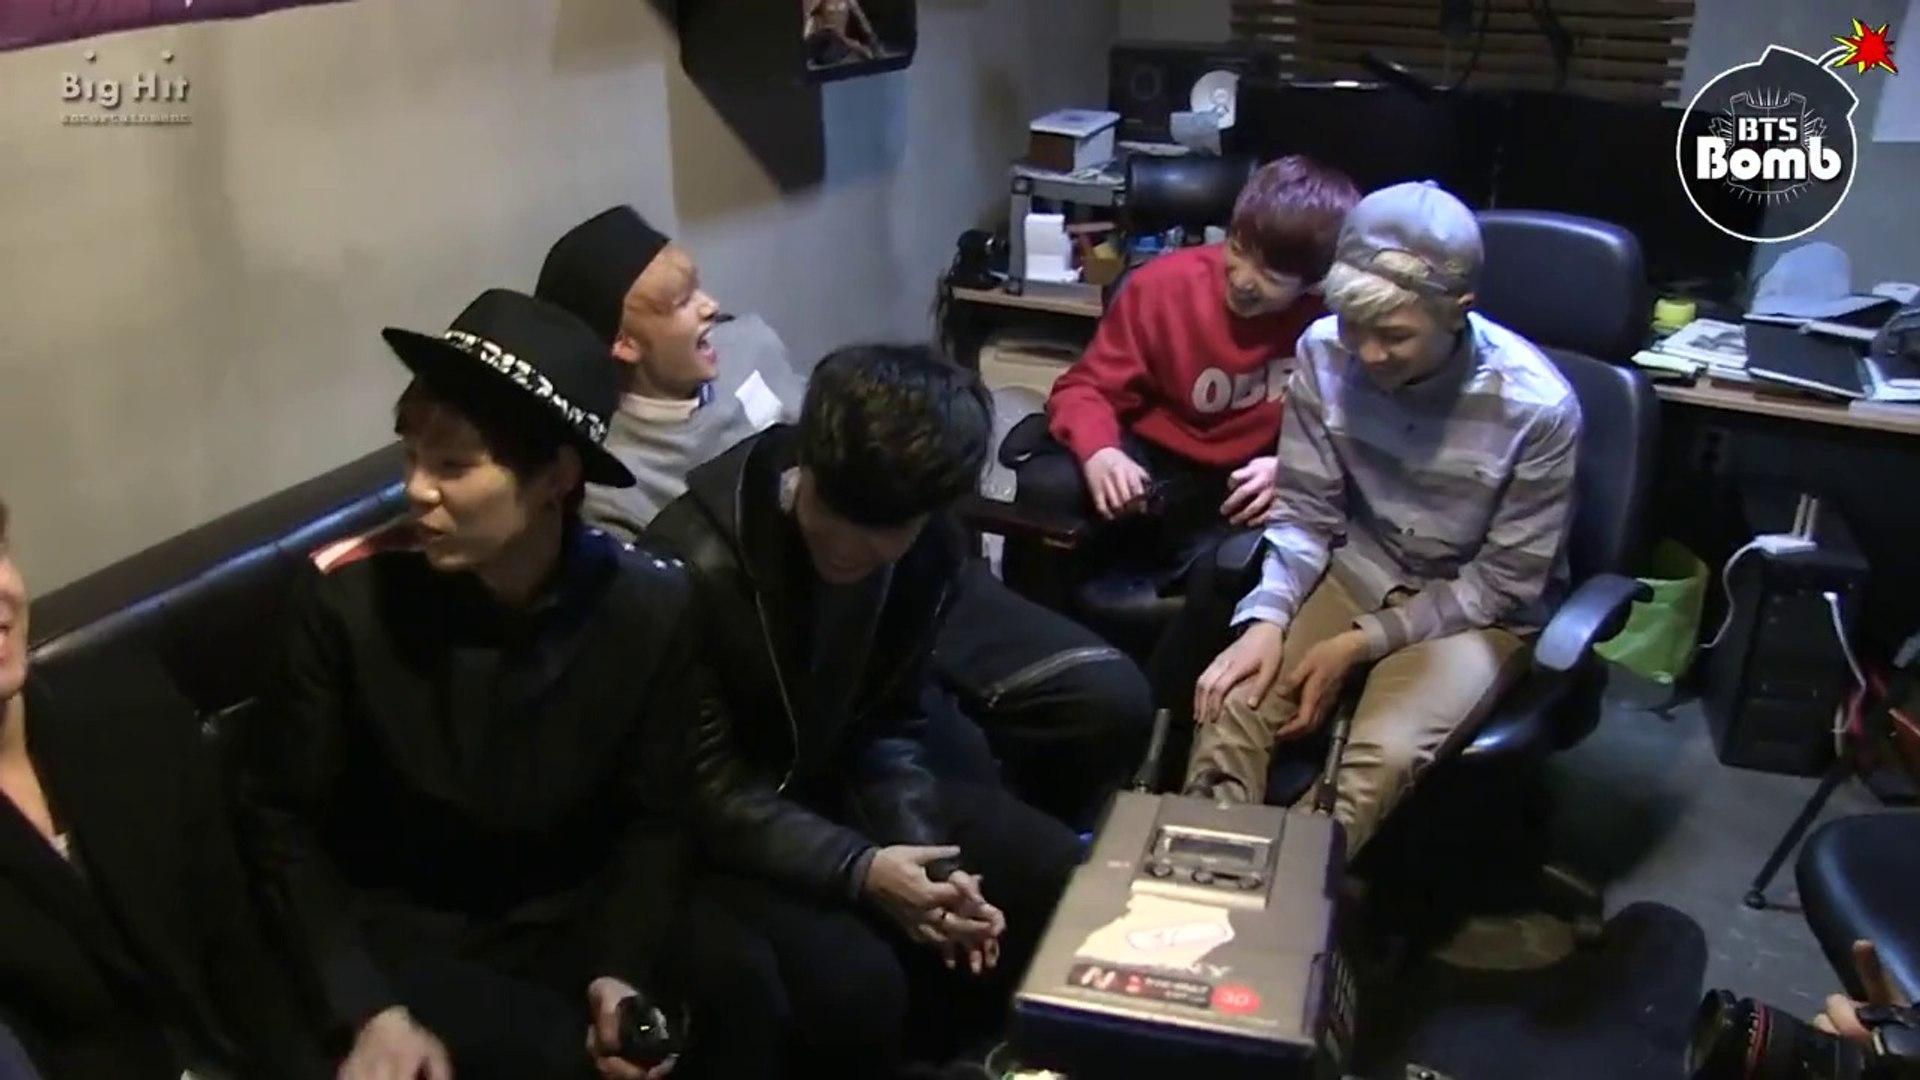 BTS Bomb - Let's test BTS' nerve!